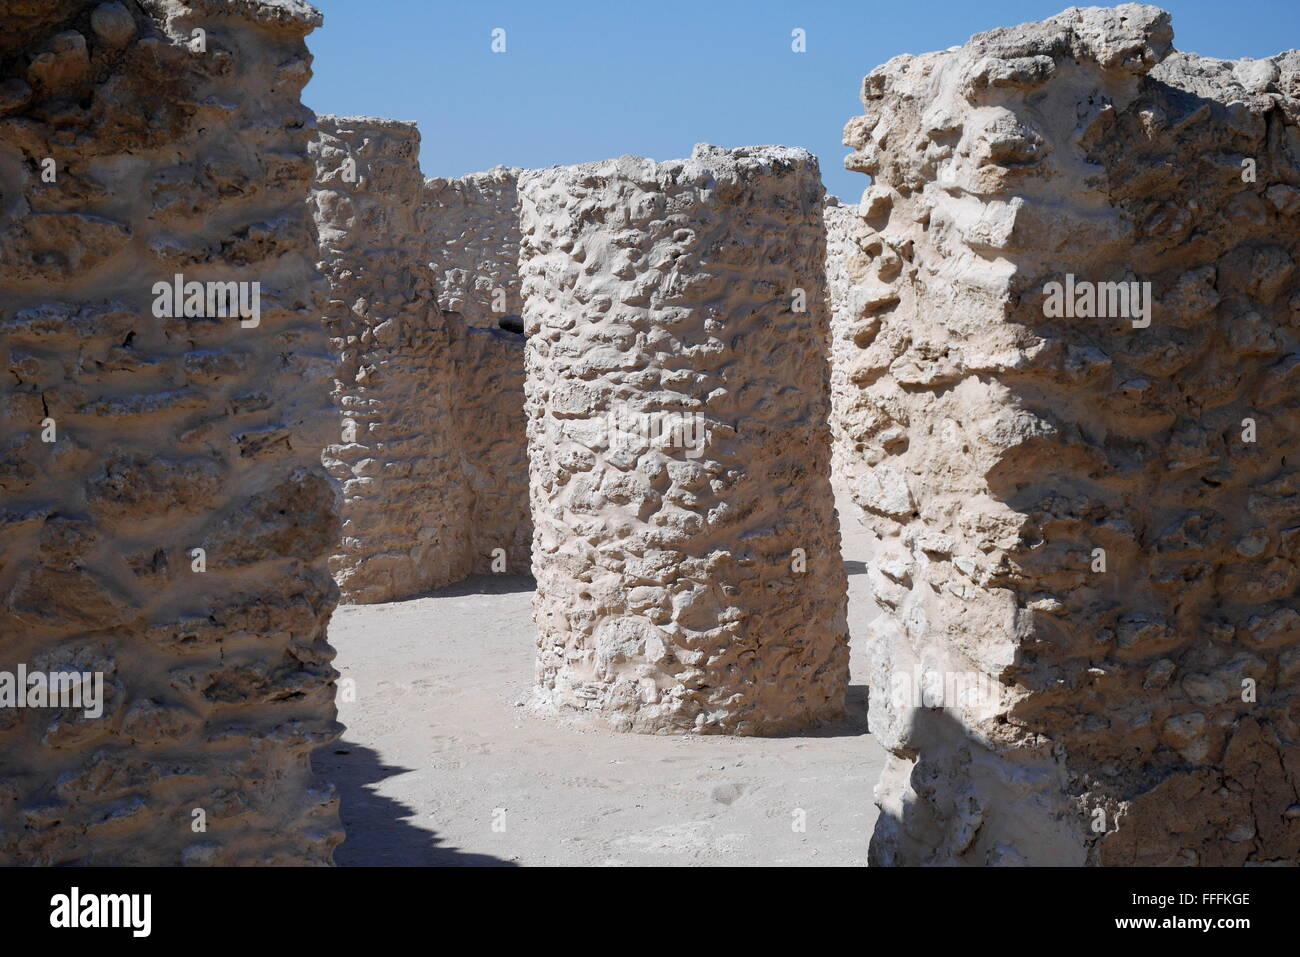 Entrance to the temple at the Dilmun era Saar Settlement, Saar, Kingdom of Bahrain - Stock Image